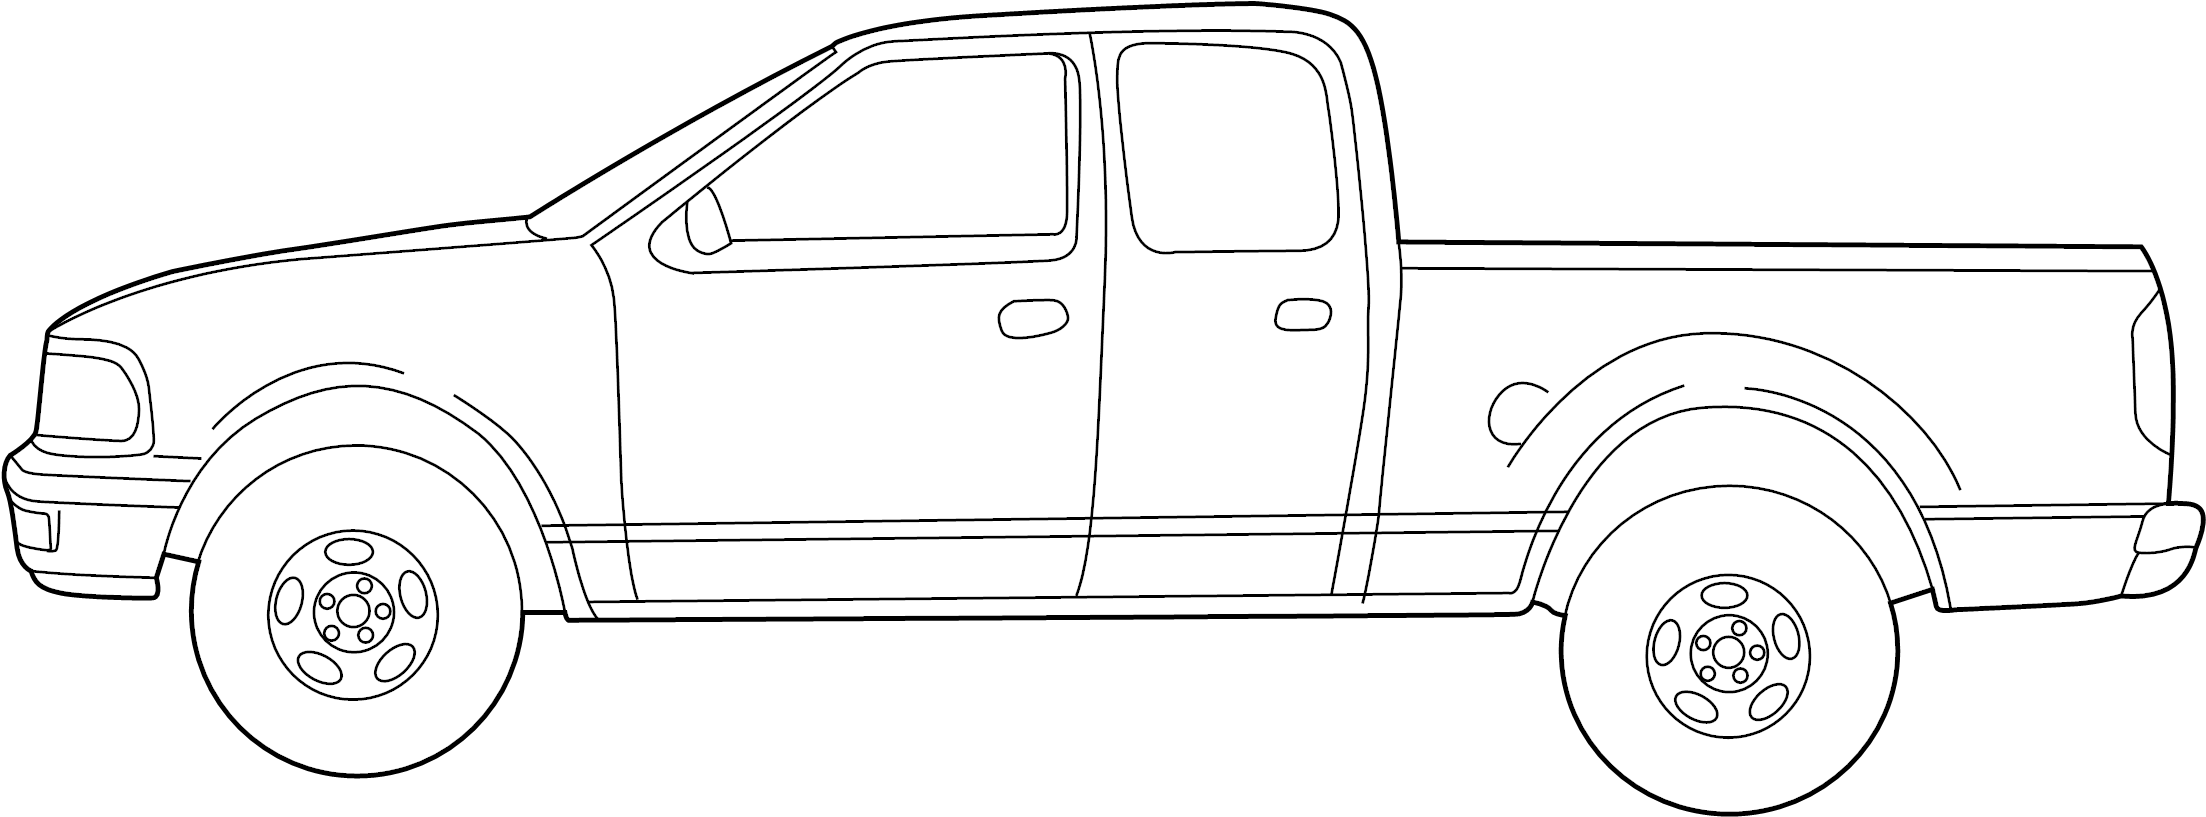 Ford F 150 Stripe Tape Kit Decal Trim Type 7 Supercrew